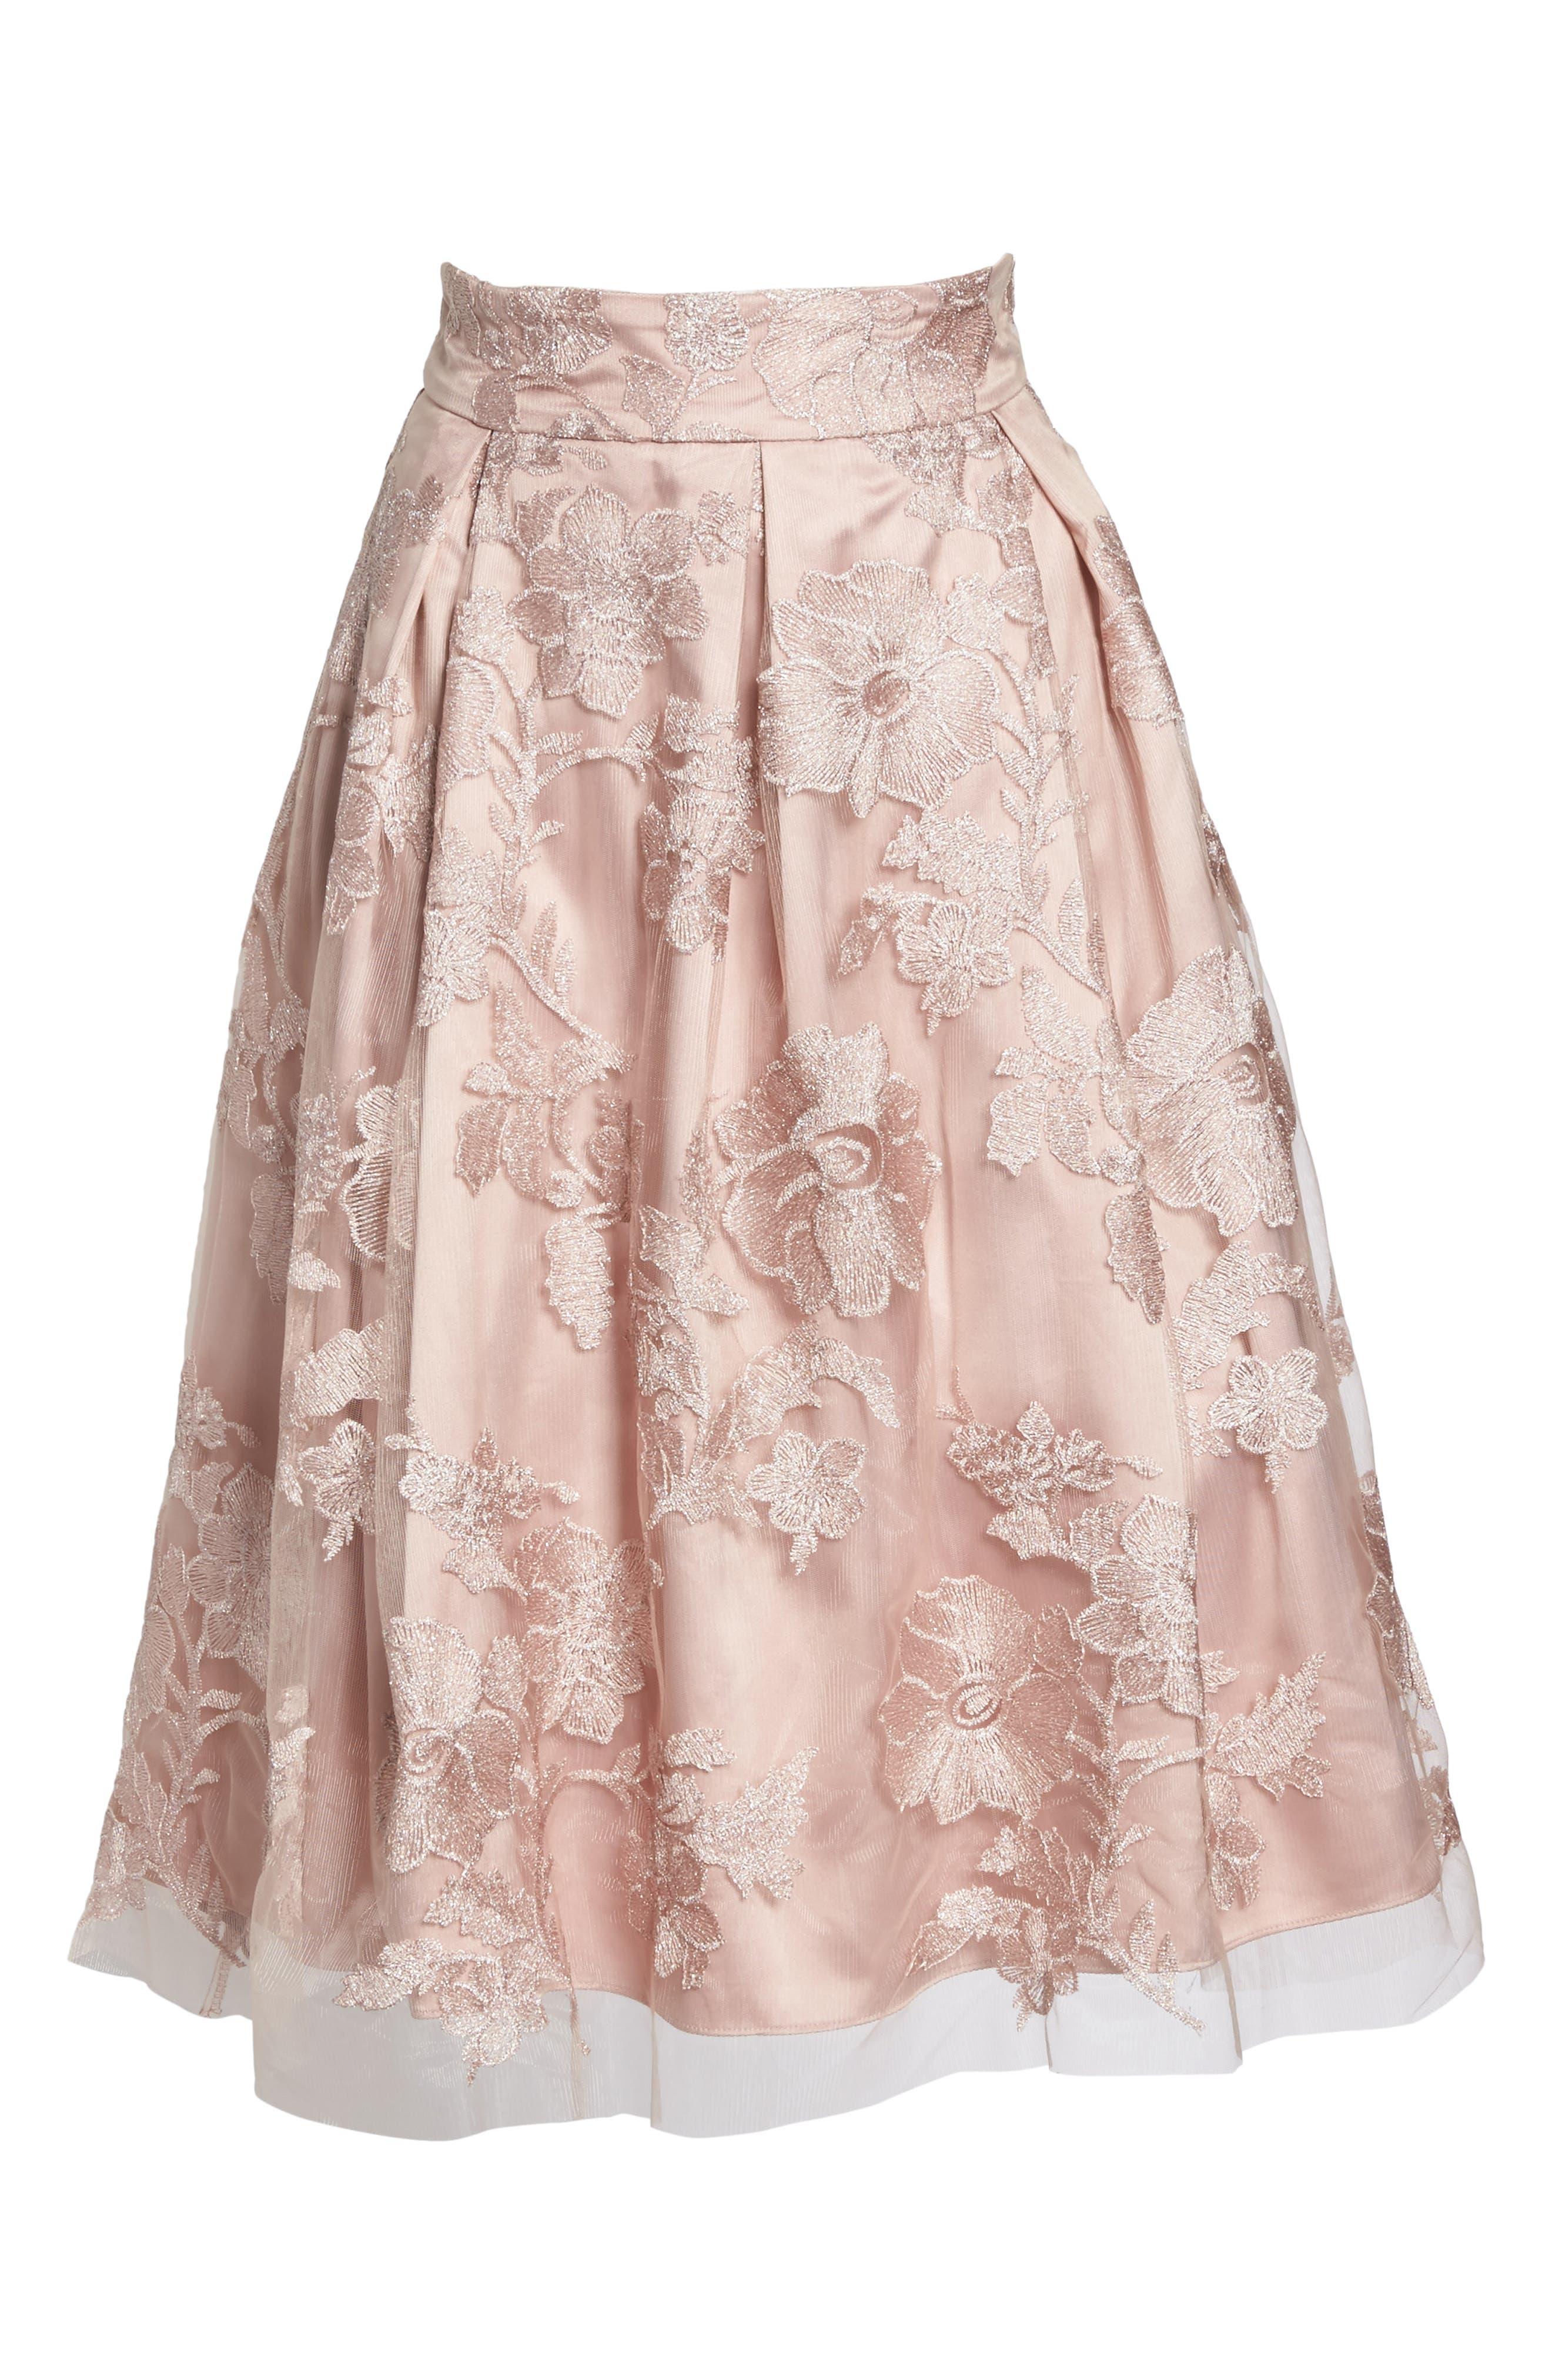 ELIZA J, Floral Embroidered Skirt, Alternate thumbnail 6, color, 254